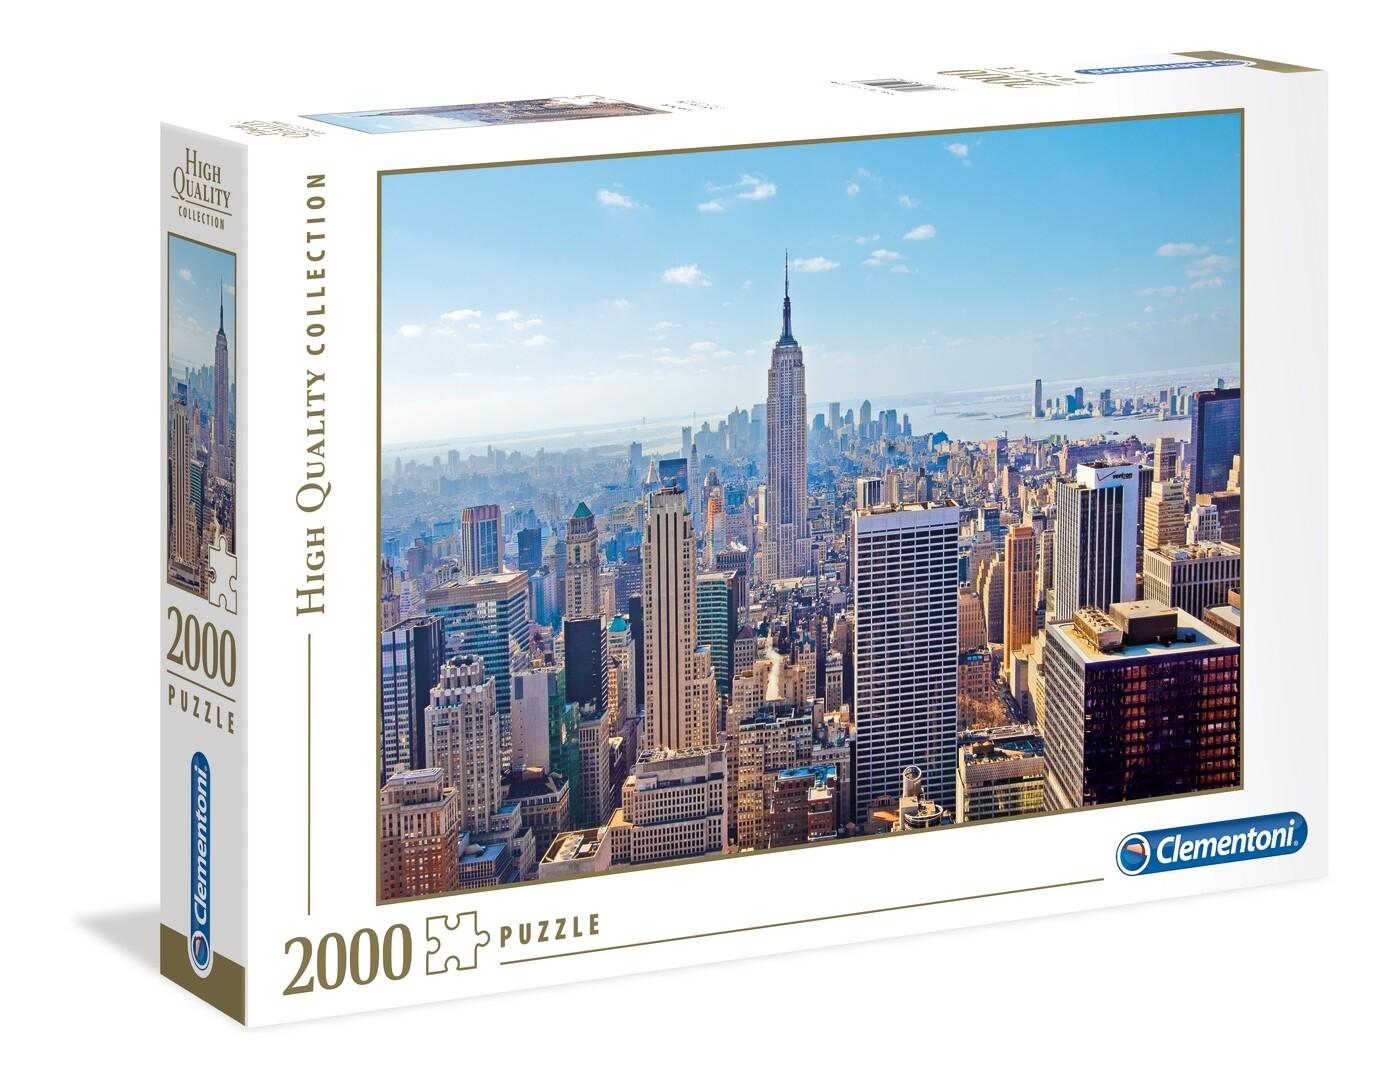 PUZZLE 2000 HQ New York - CLEMENTONI